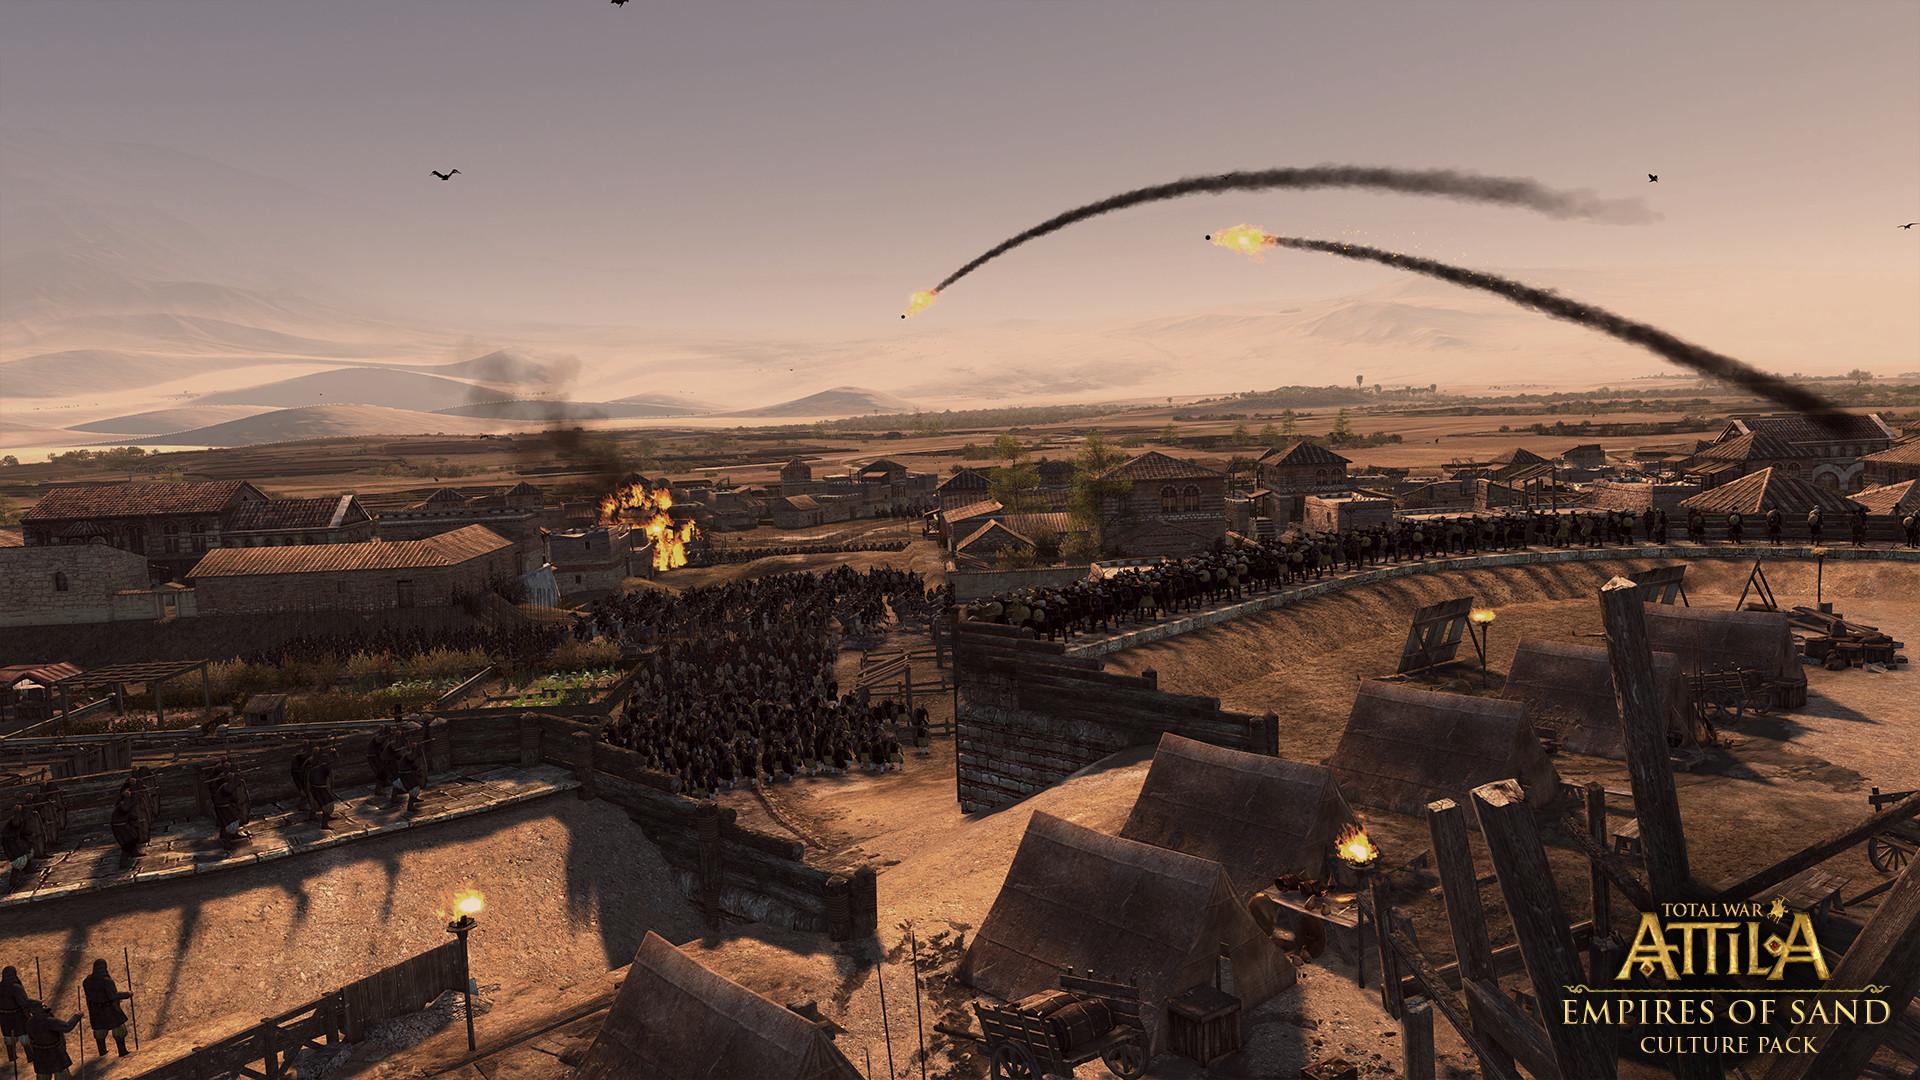 Total War: ATTILA - Empires of Sand Culture Pack Fiyat Karşılaştırma